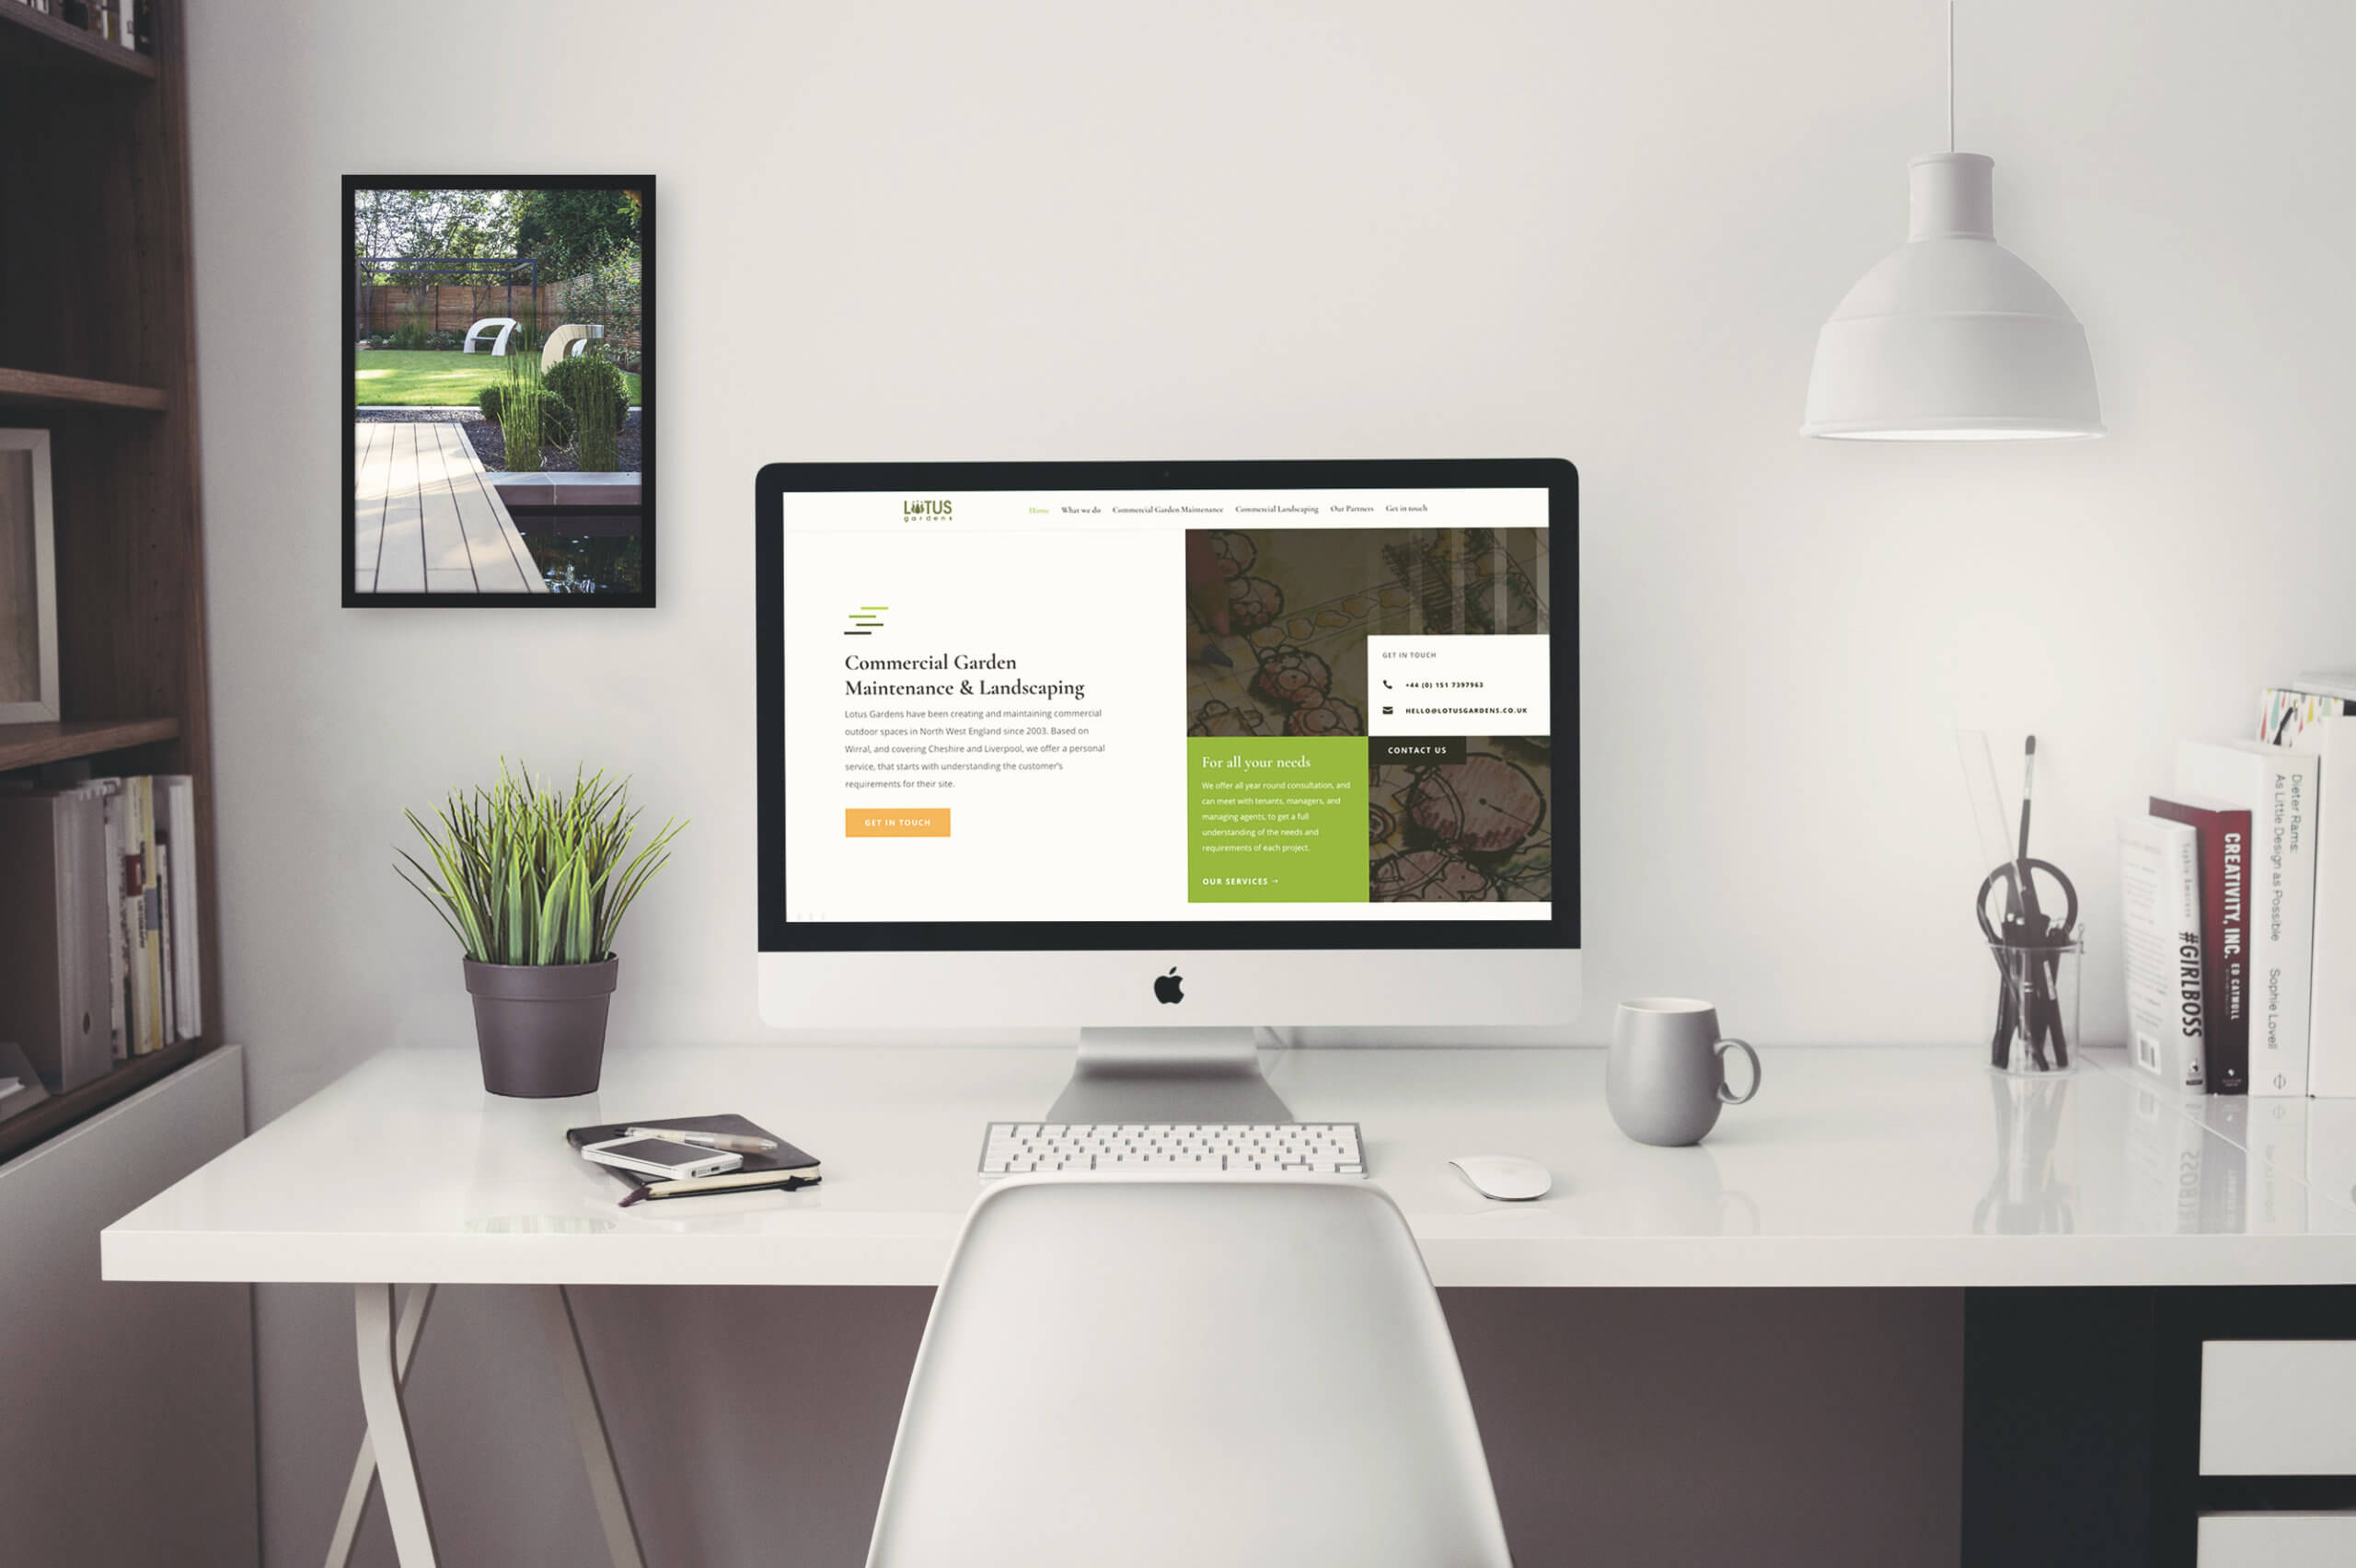 Garding website design project